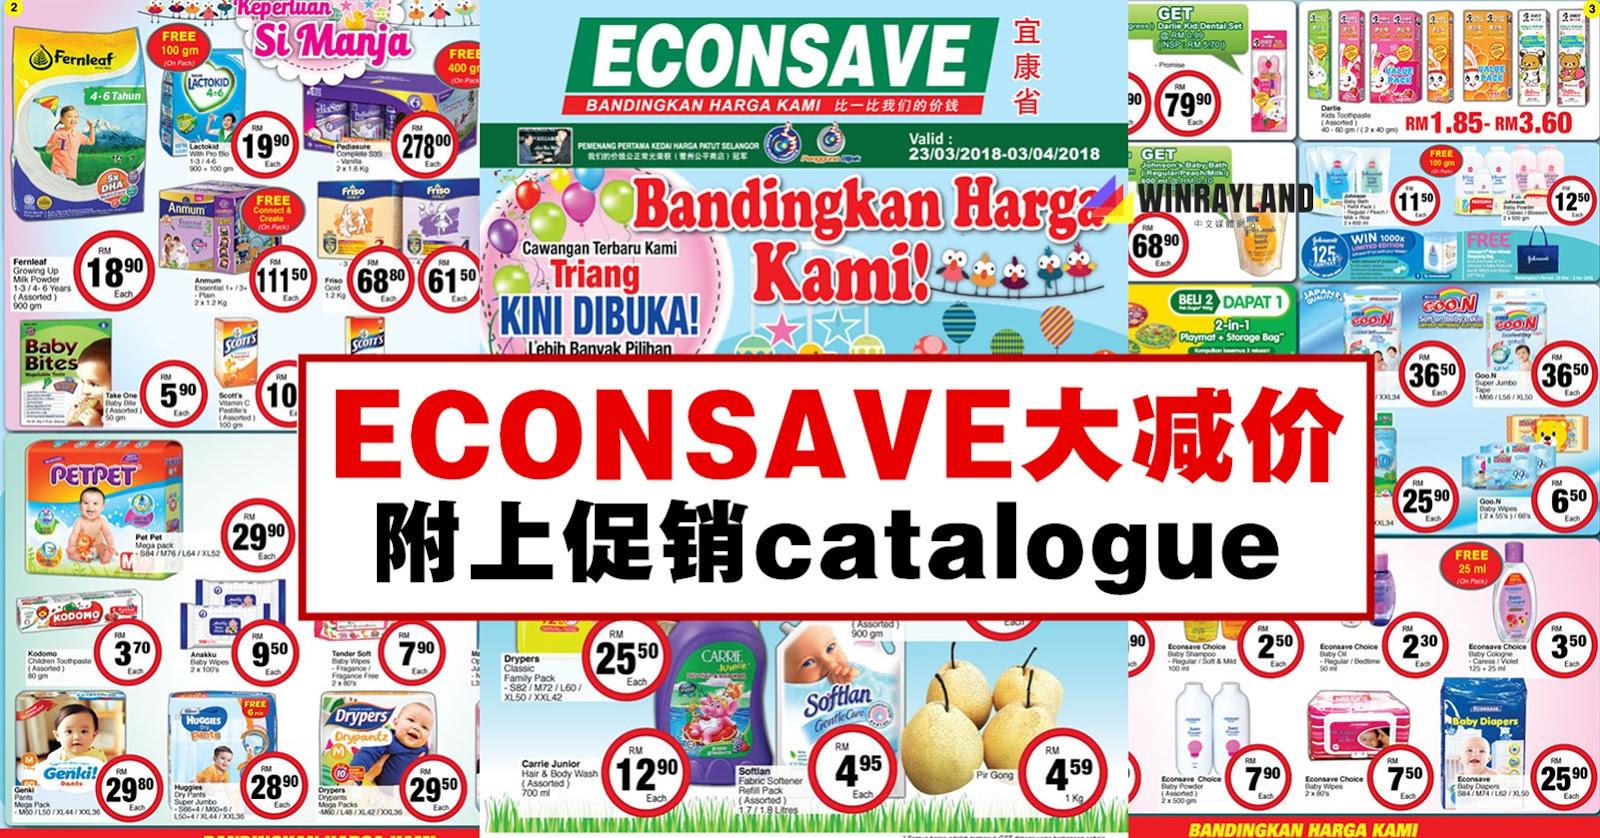 ECONSAVE 婴儿产品大减价